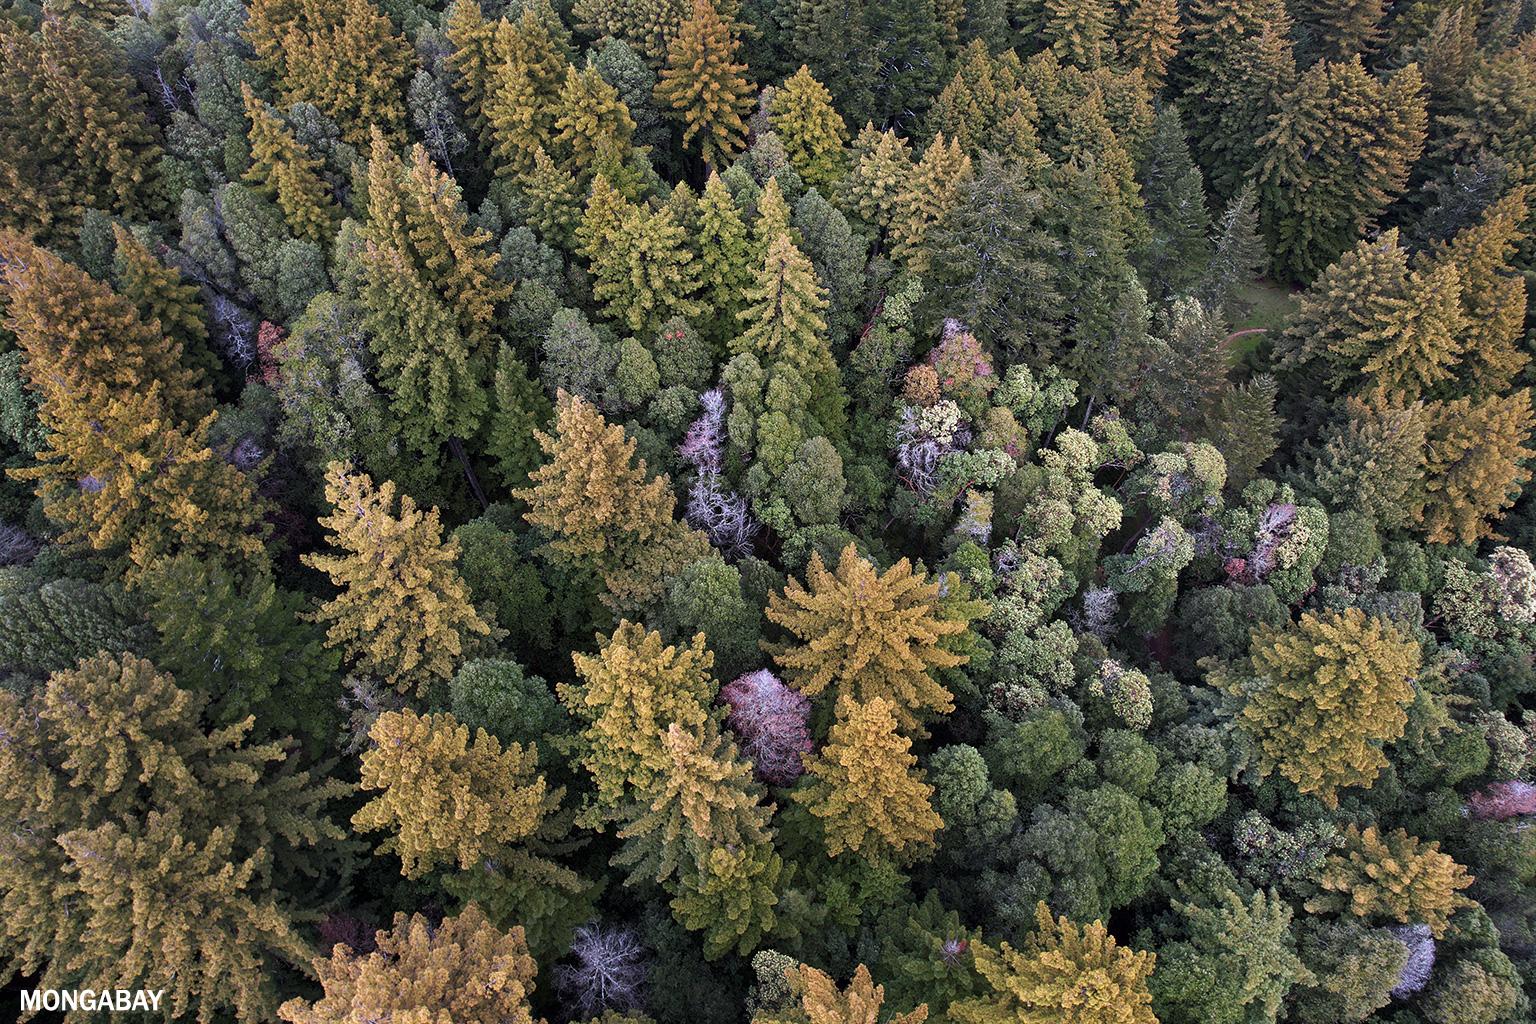 Redwood trees in California. Photo credit: Rhett A. Butler